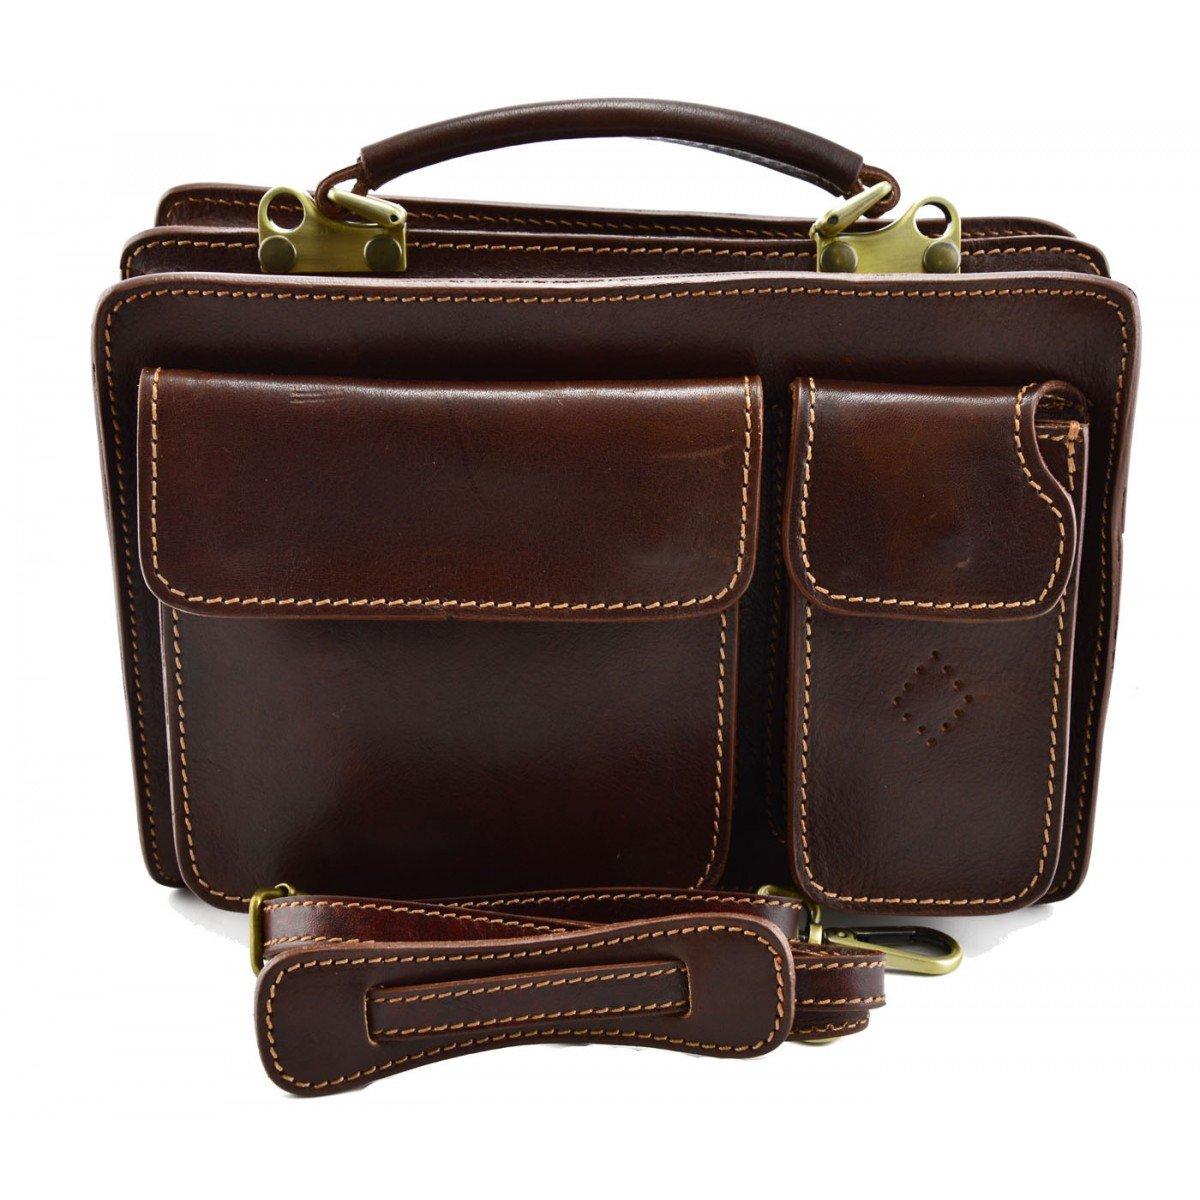 Made In Italy Genuine Genuine Leather Business Bag Brown Mod. Mini Bag Color Brown - Business Bag B01N4V4FEO, メンズワイシャツ専門店サルトリア:4672bc2e --- forums.joybit.com